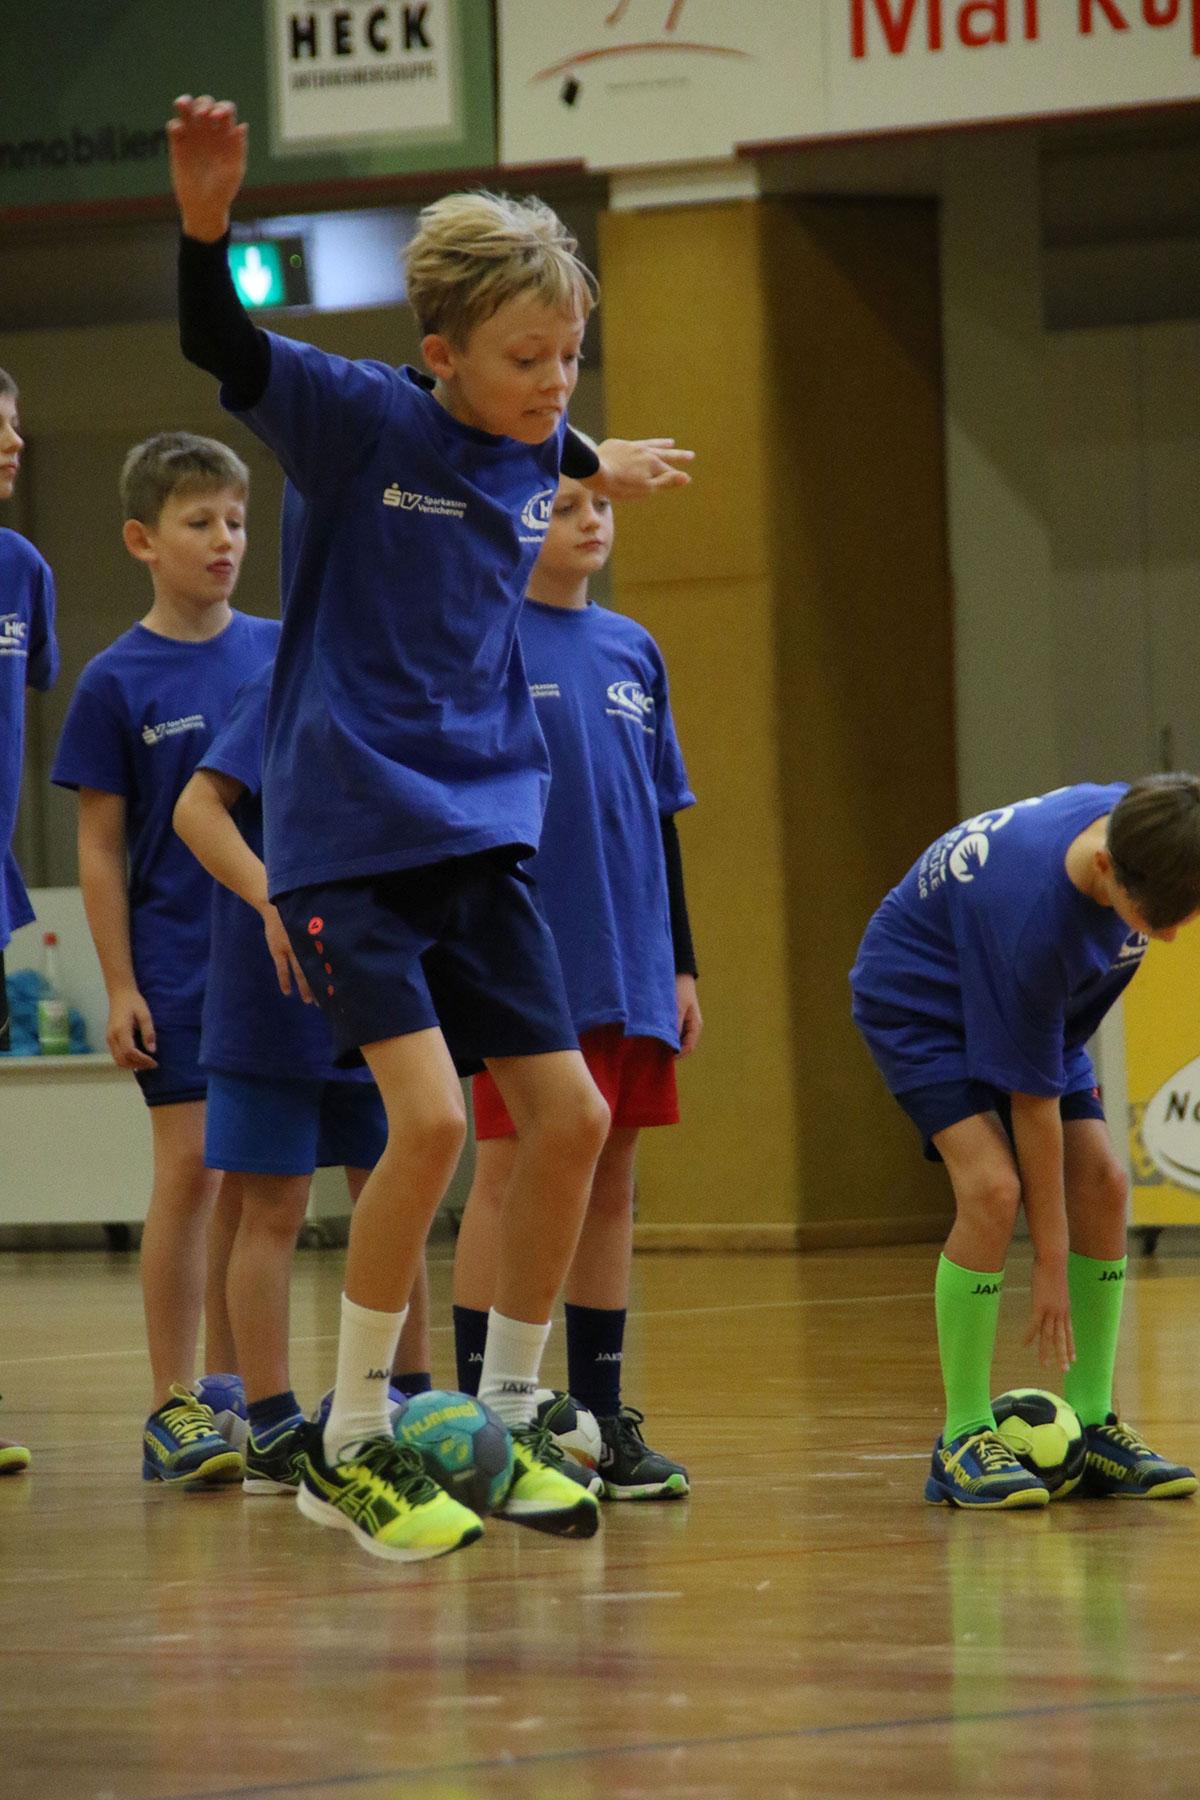 201809_Handballcamp_NDH (64)